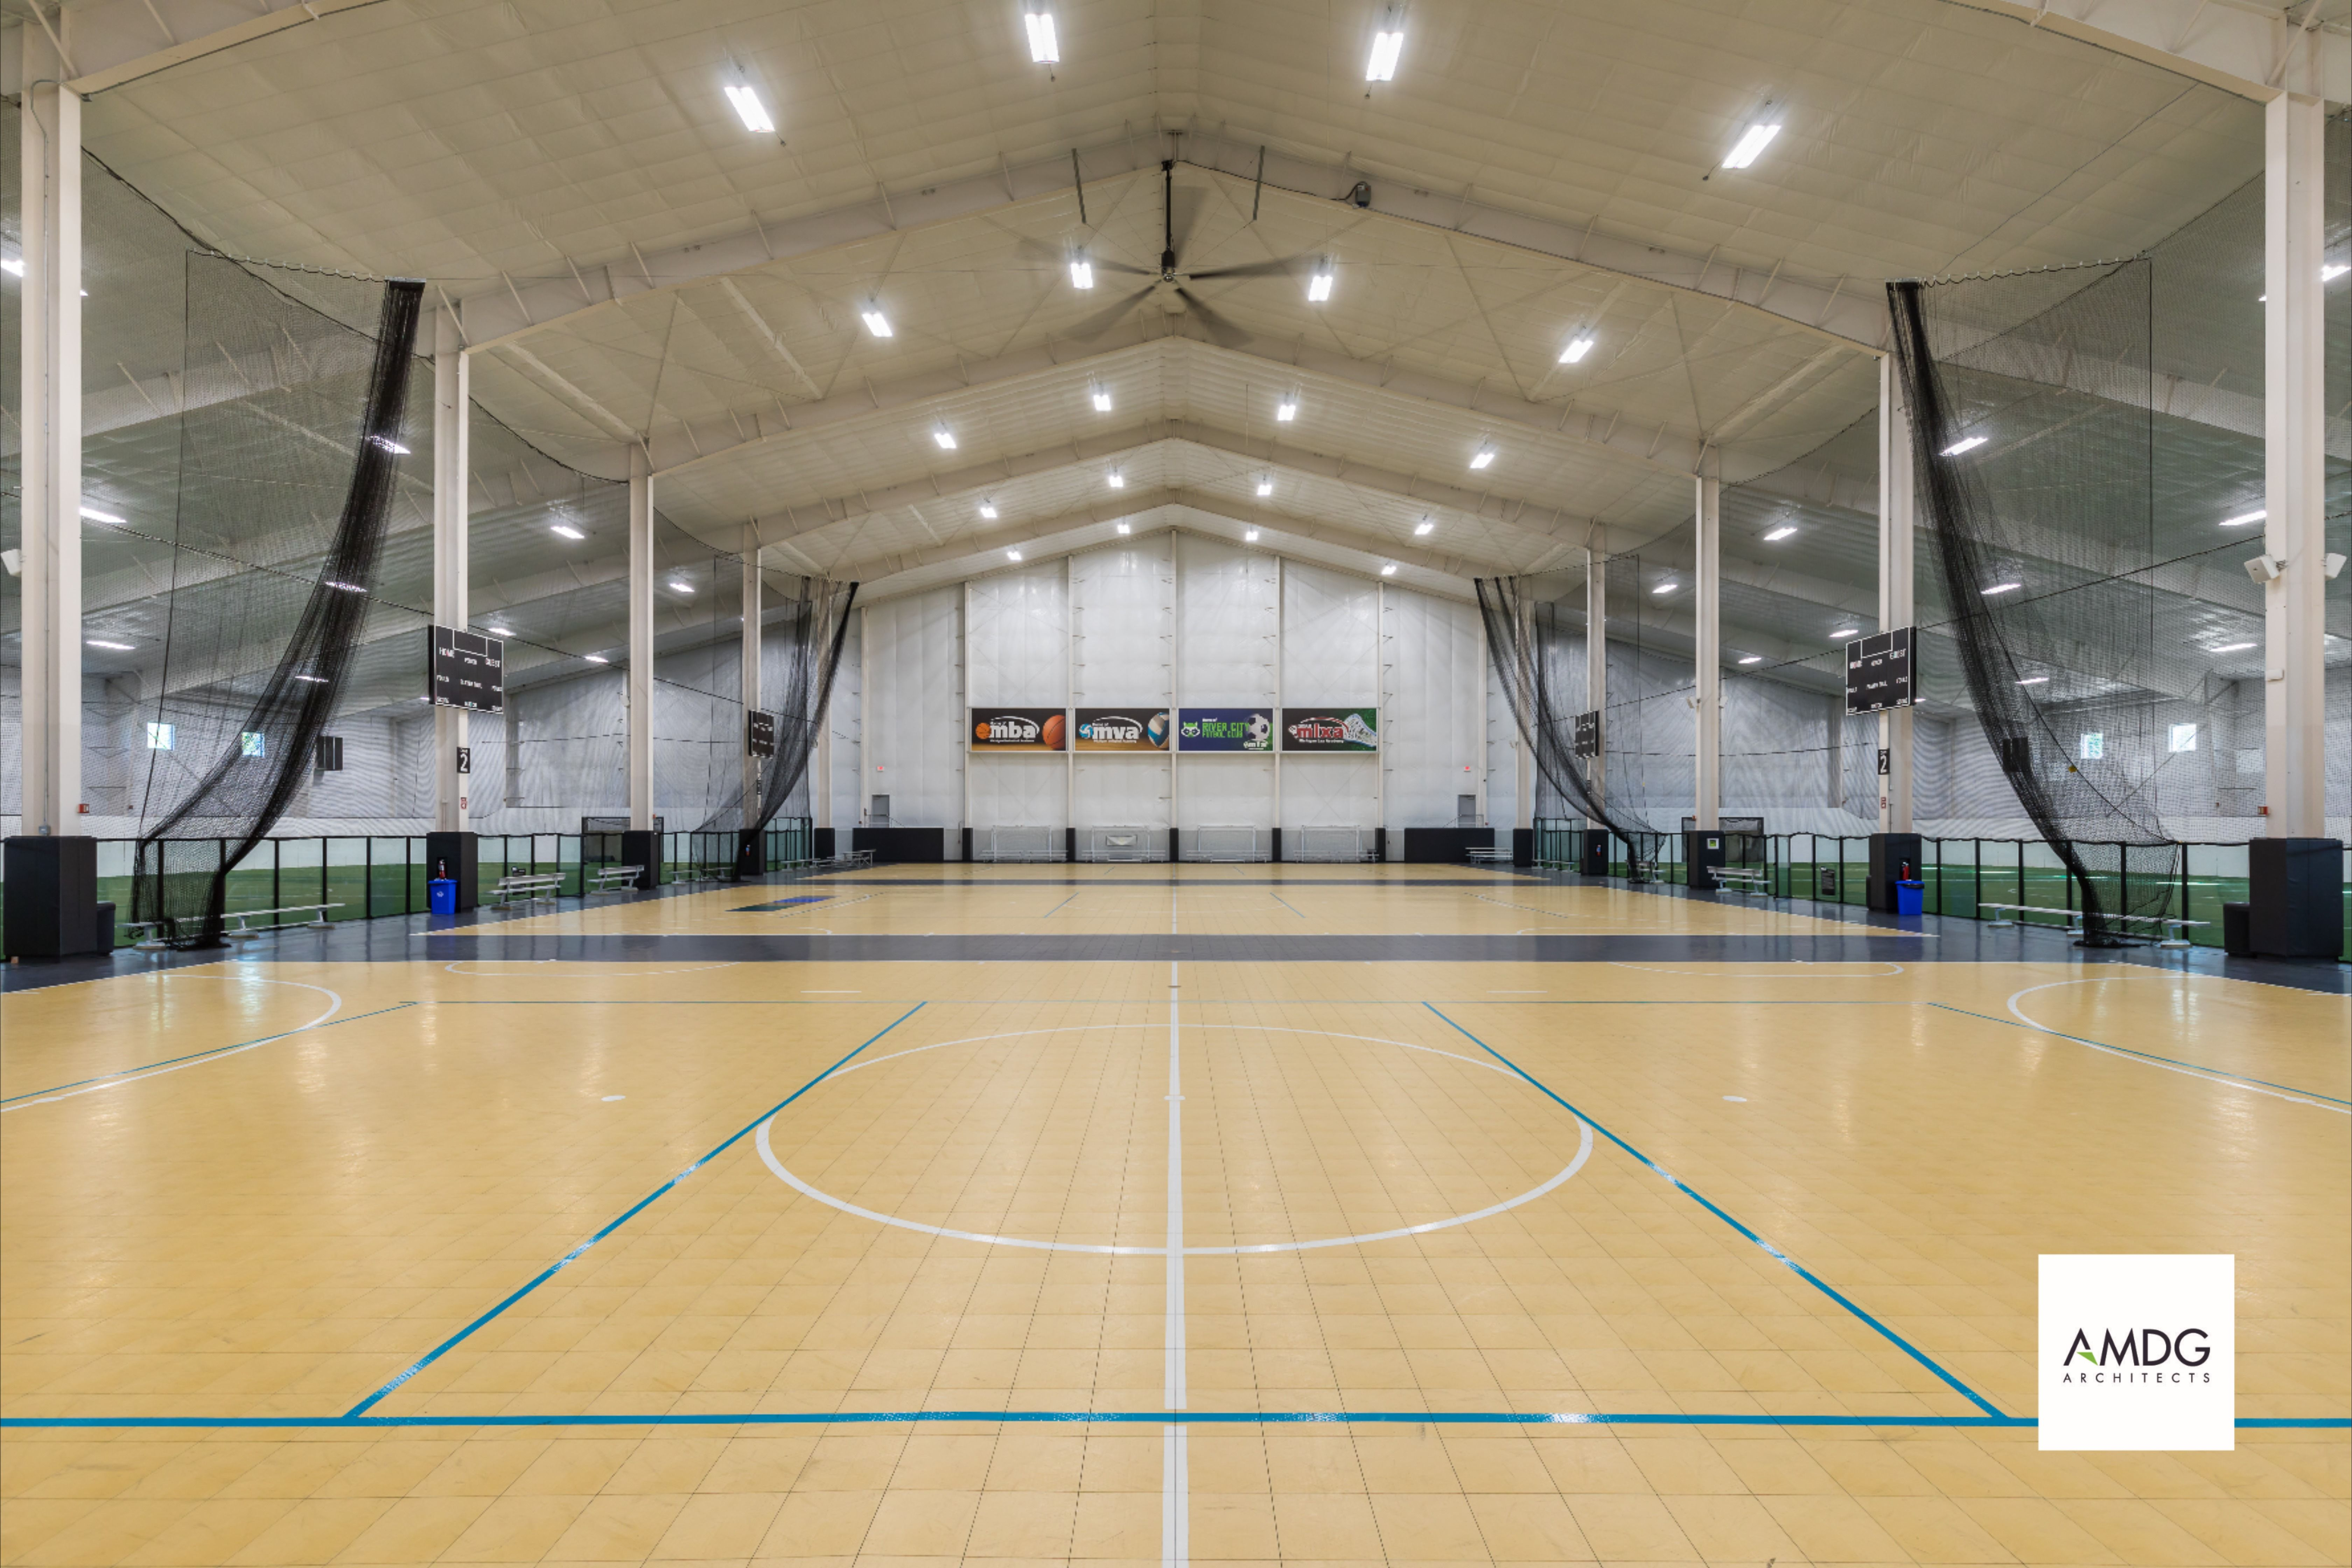 Interior Amdg Architects Grand Rapids Mi Architect Grand Rapids Sports